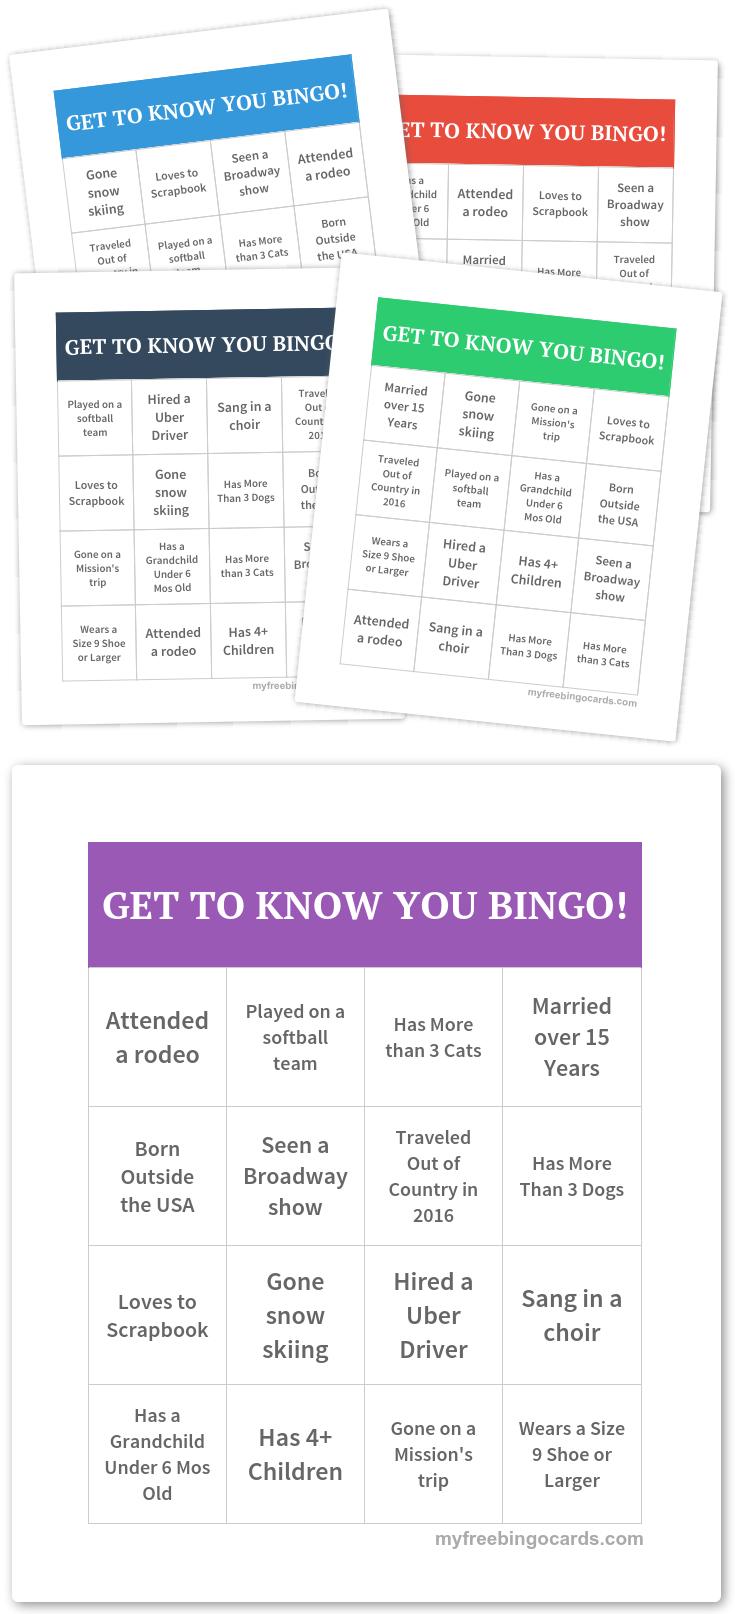 Get To Know You Bingo! | Bingo Cards Printable, Bingo